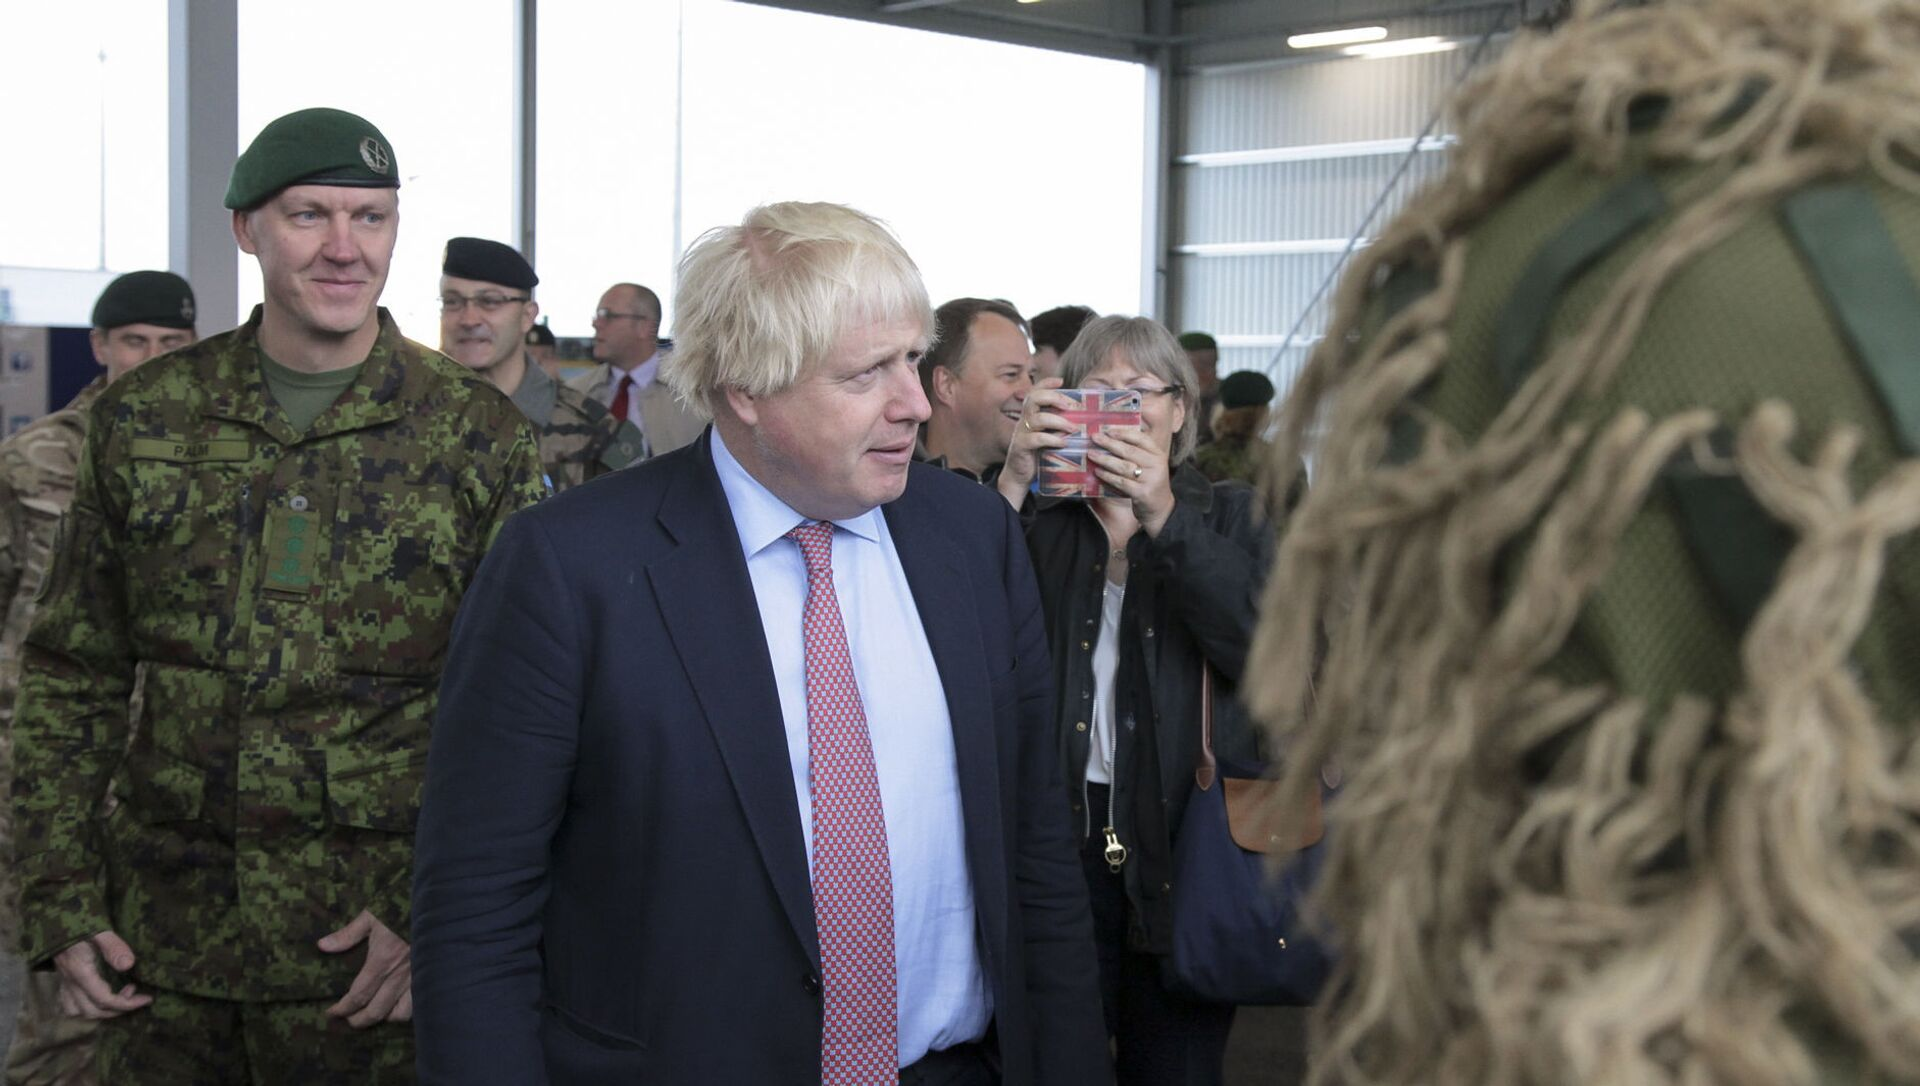 In this Estonian Army photo made available on Friday, Sept. 8 2017, British Foreign Secretary Boris Johnson visits a NATO military unit outside Tallinn, Estonia - Sputnik International, 1920, 14.06.2021